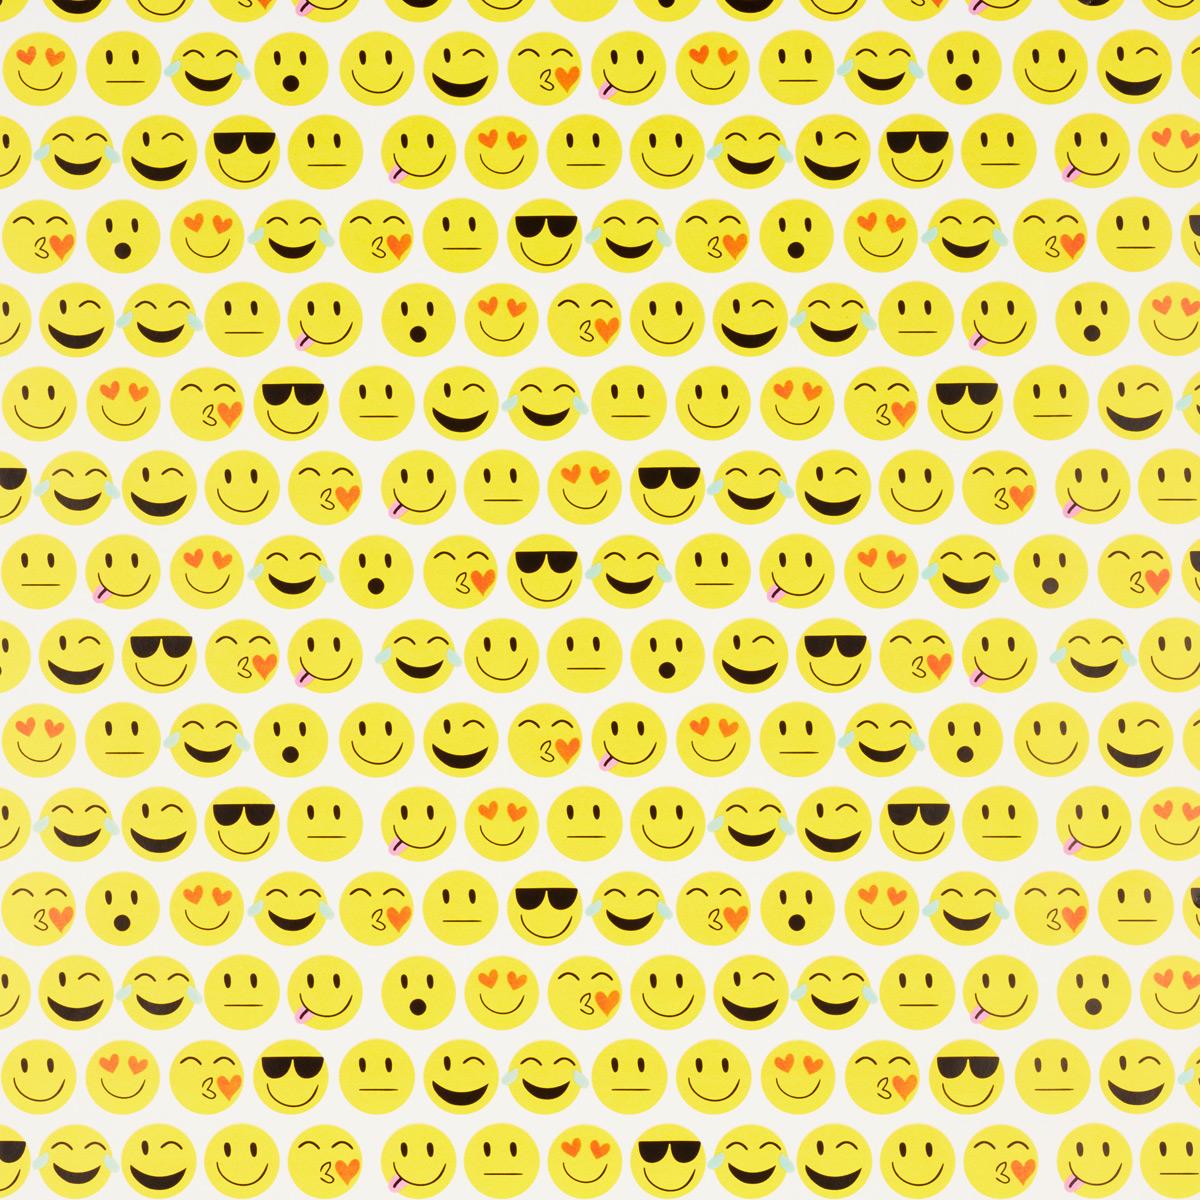 Wrap Emoji